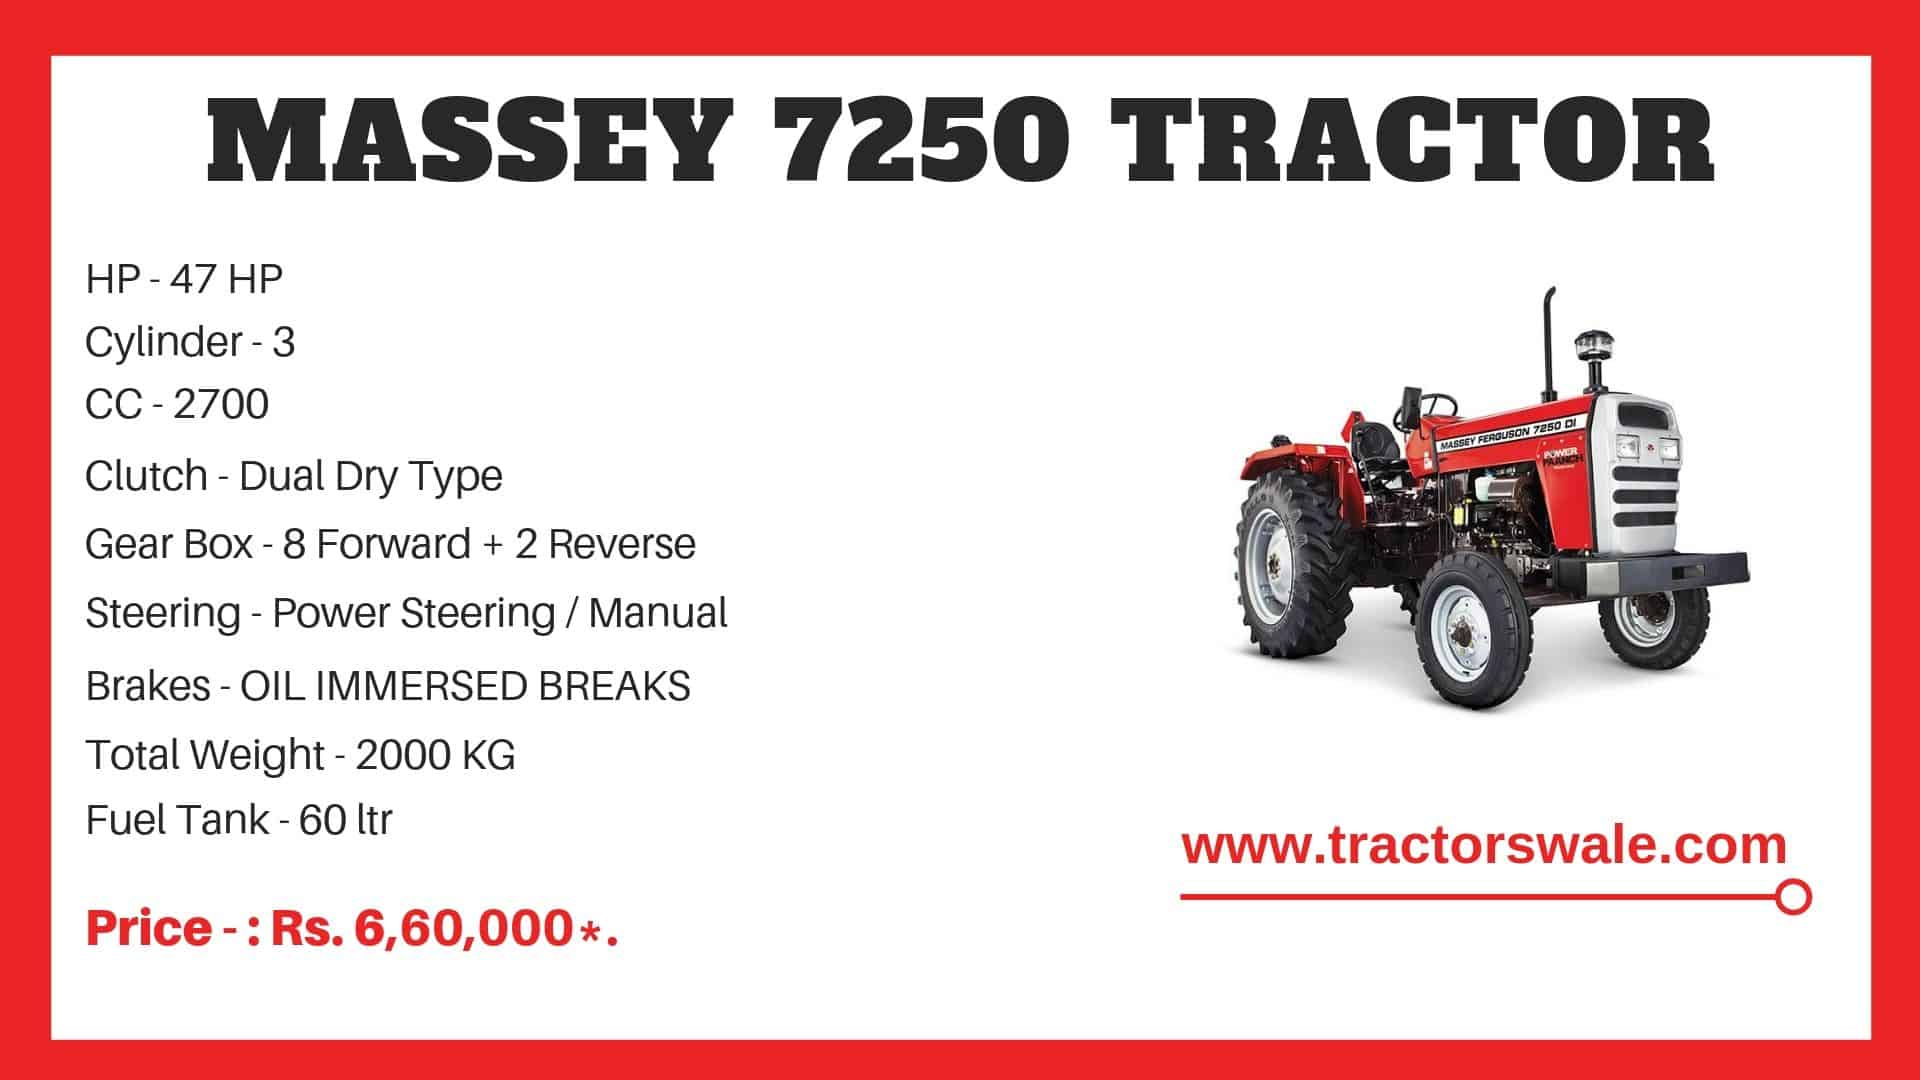 Specifications Of Massey Ferguson 7250 Tractor